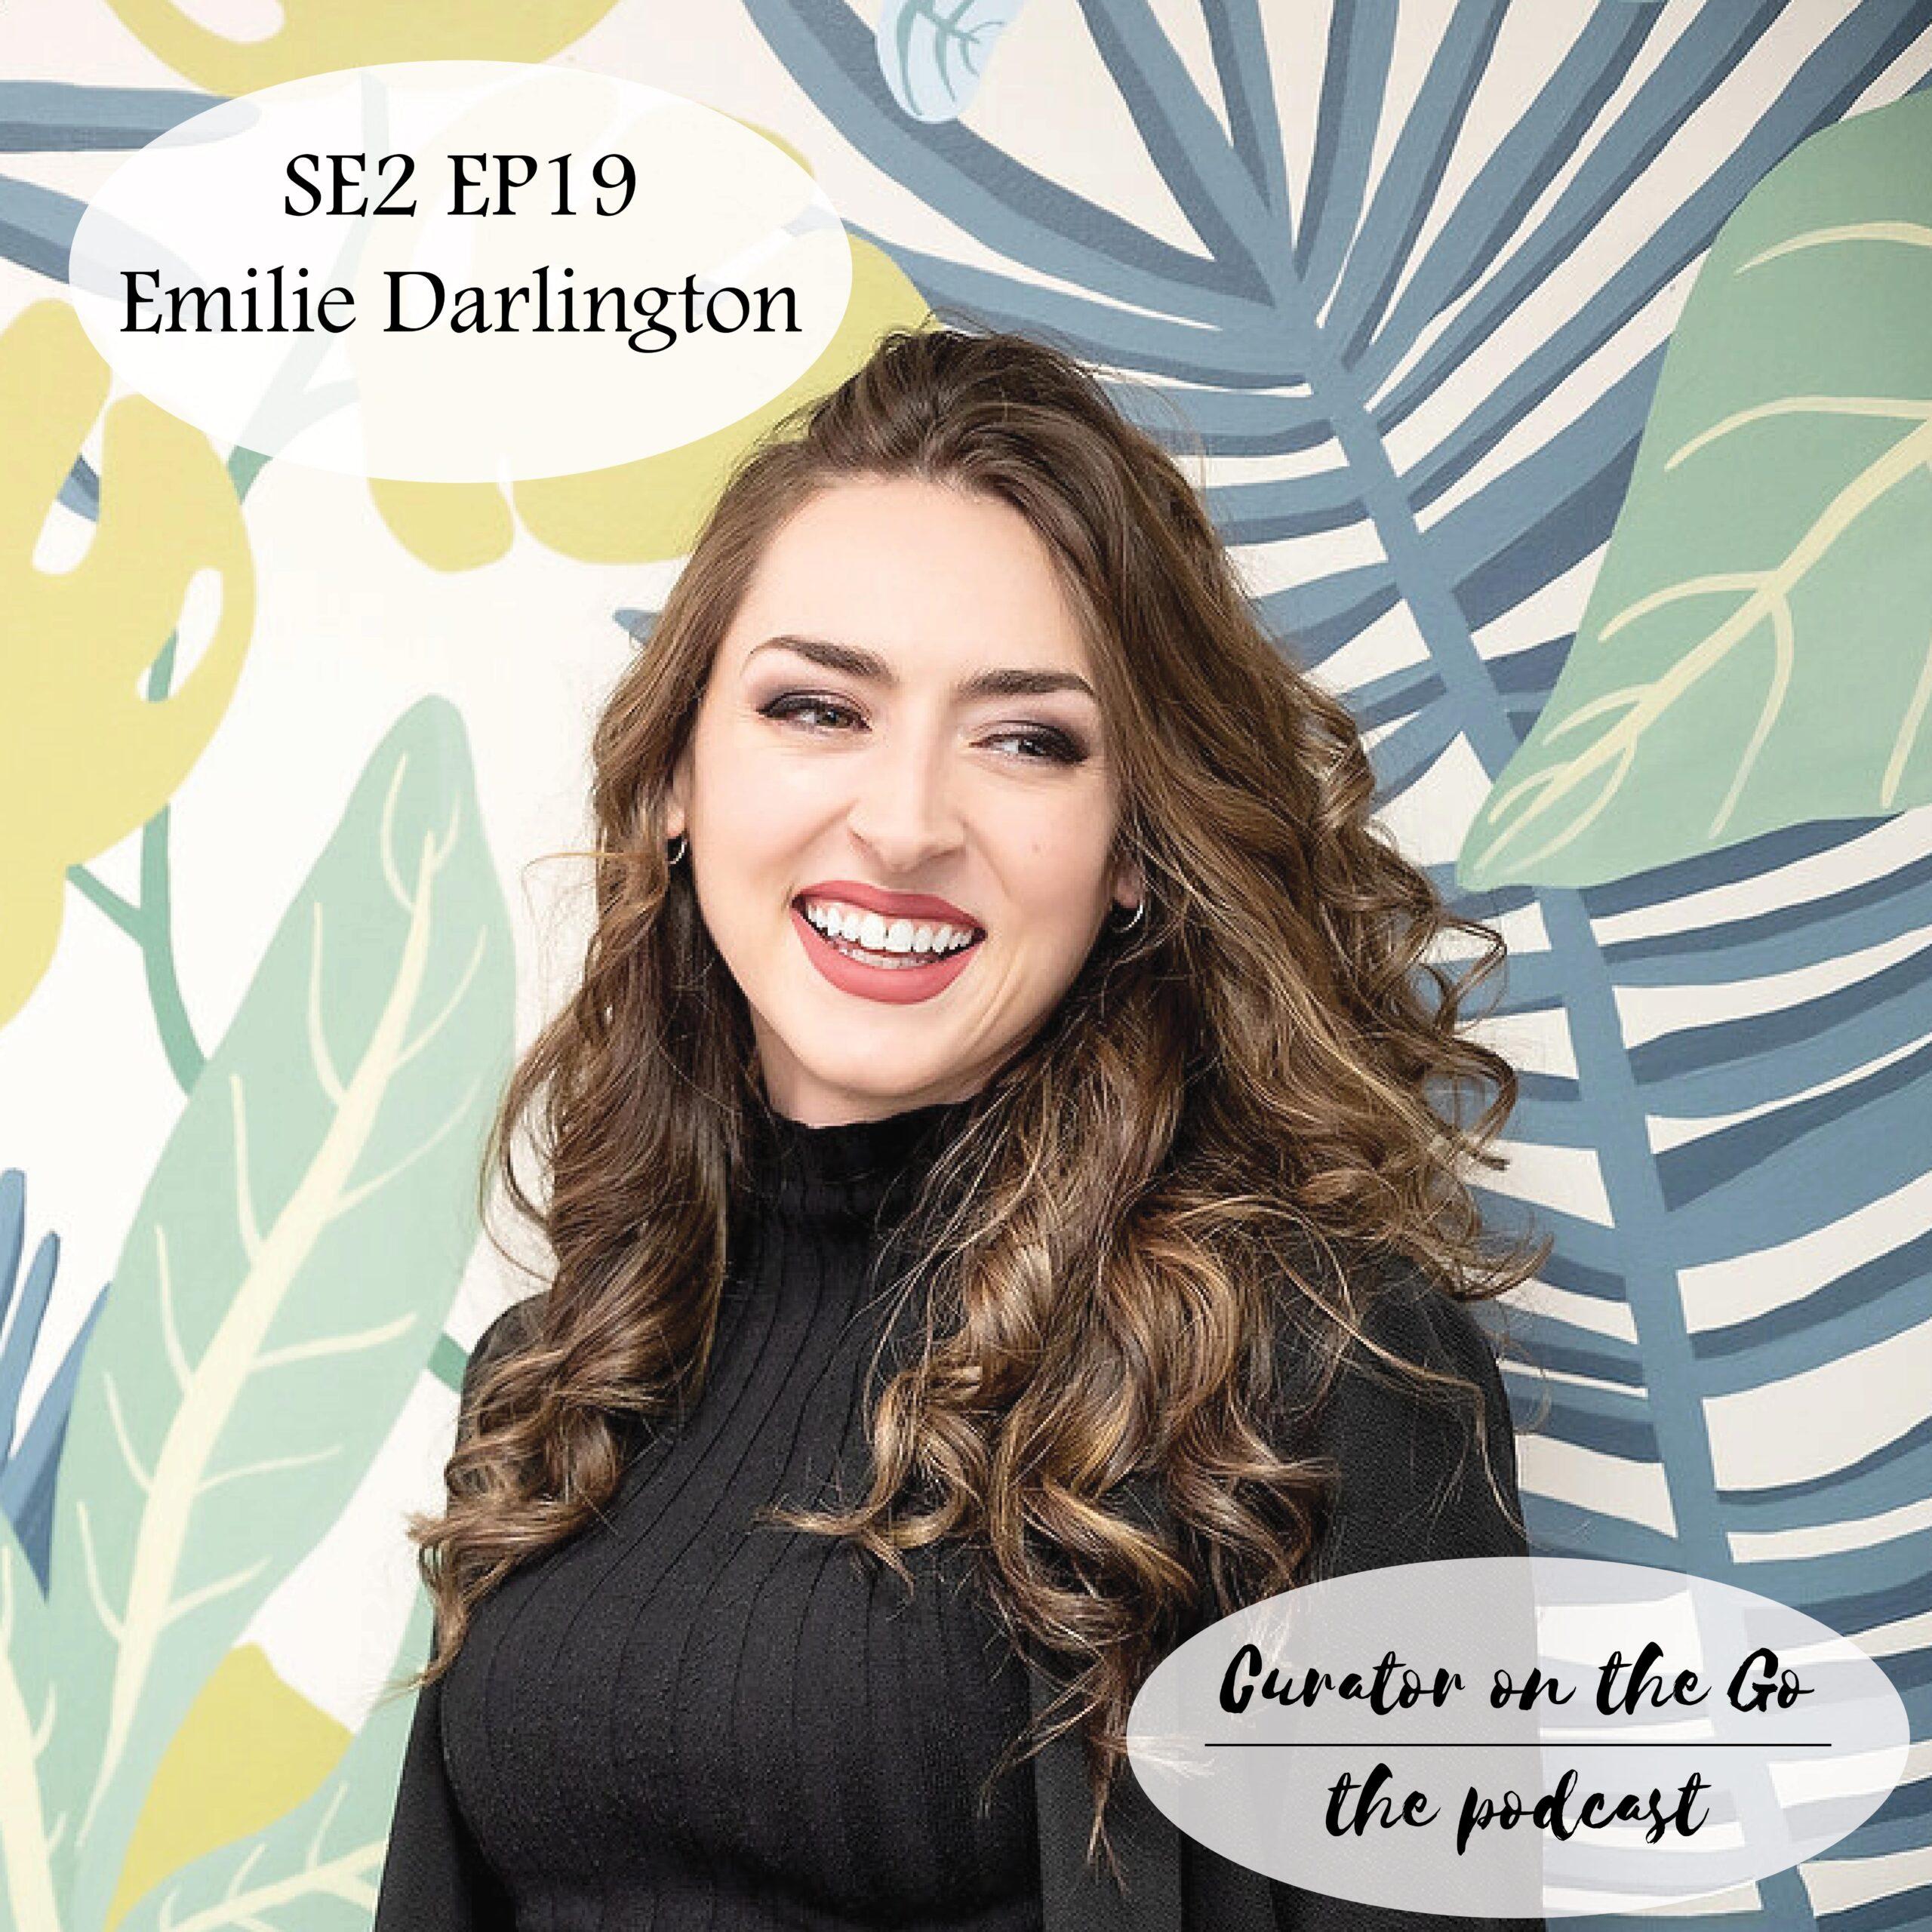 Emilie Darlington